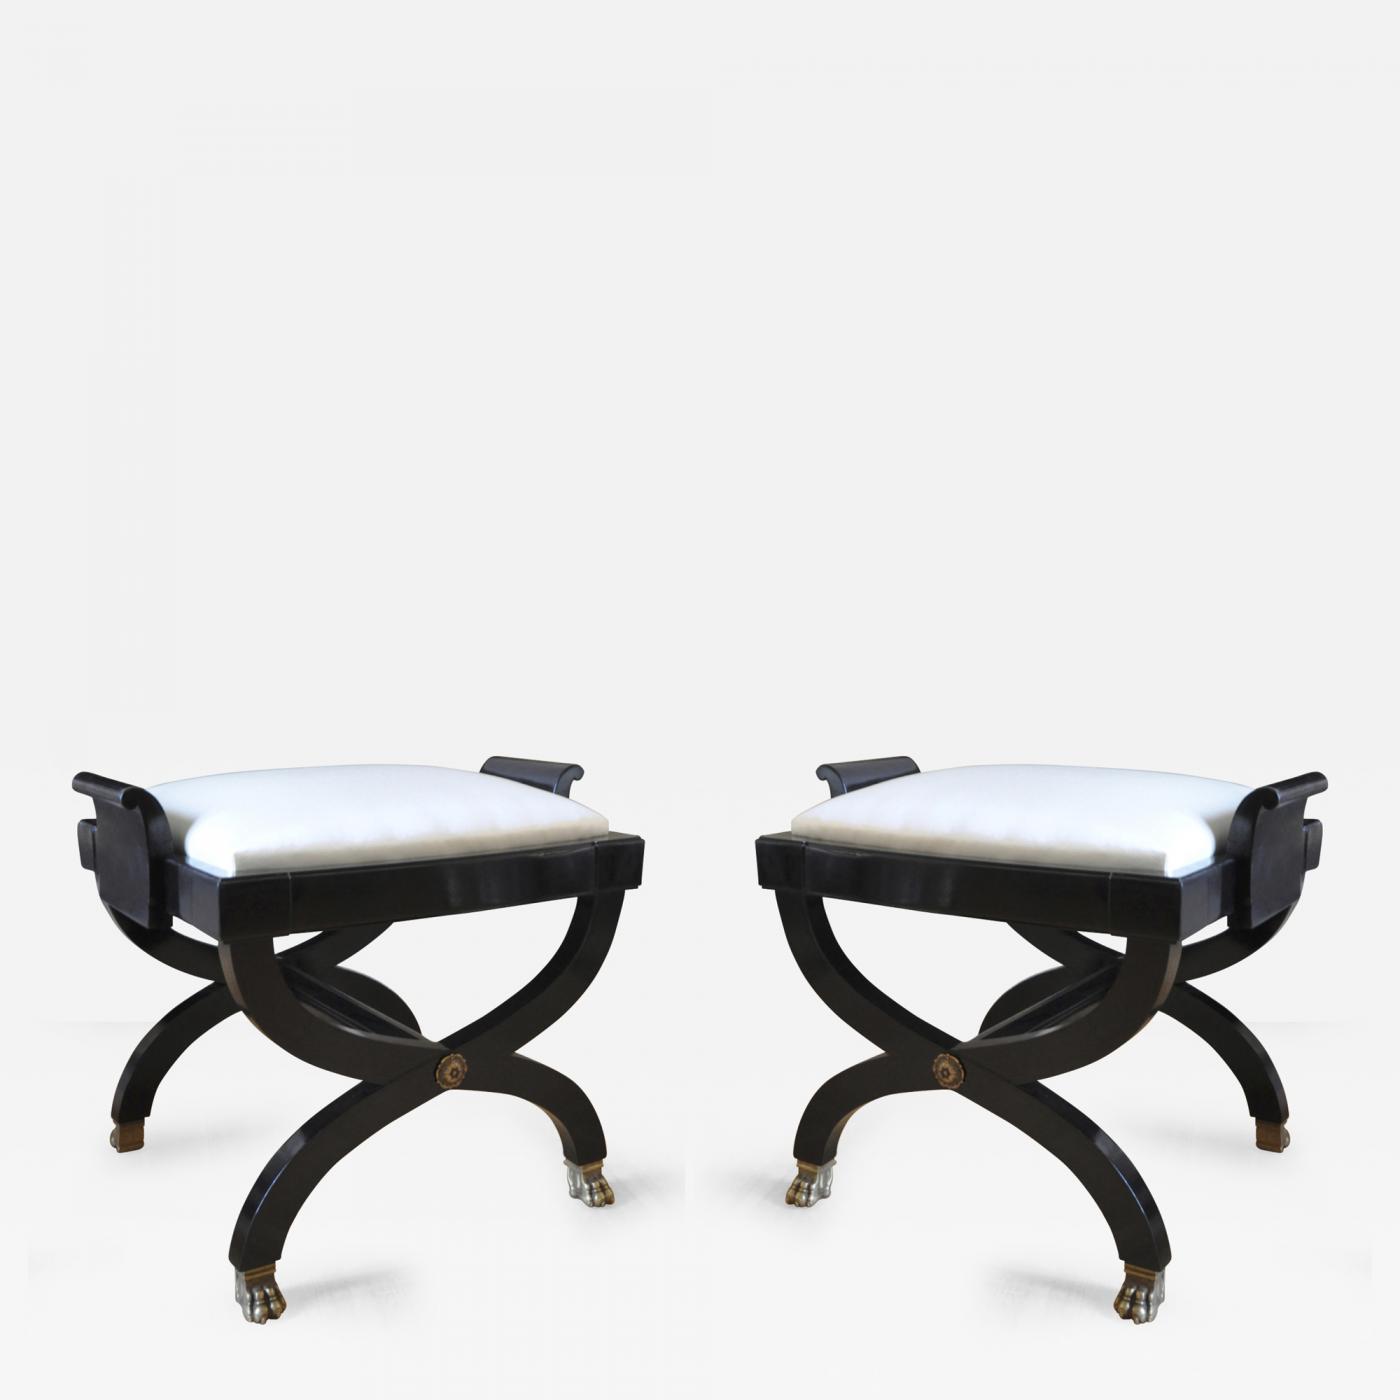 Fabulous Maison Jansen Maison Jansen Superb Pair Of X Black Stool Beatyapartments Chair Design Images Beatyapartmentscom